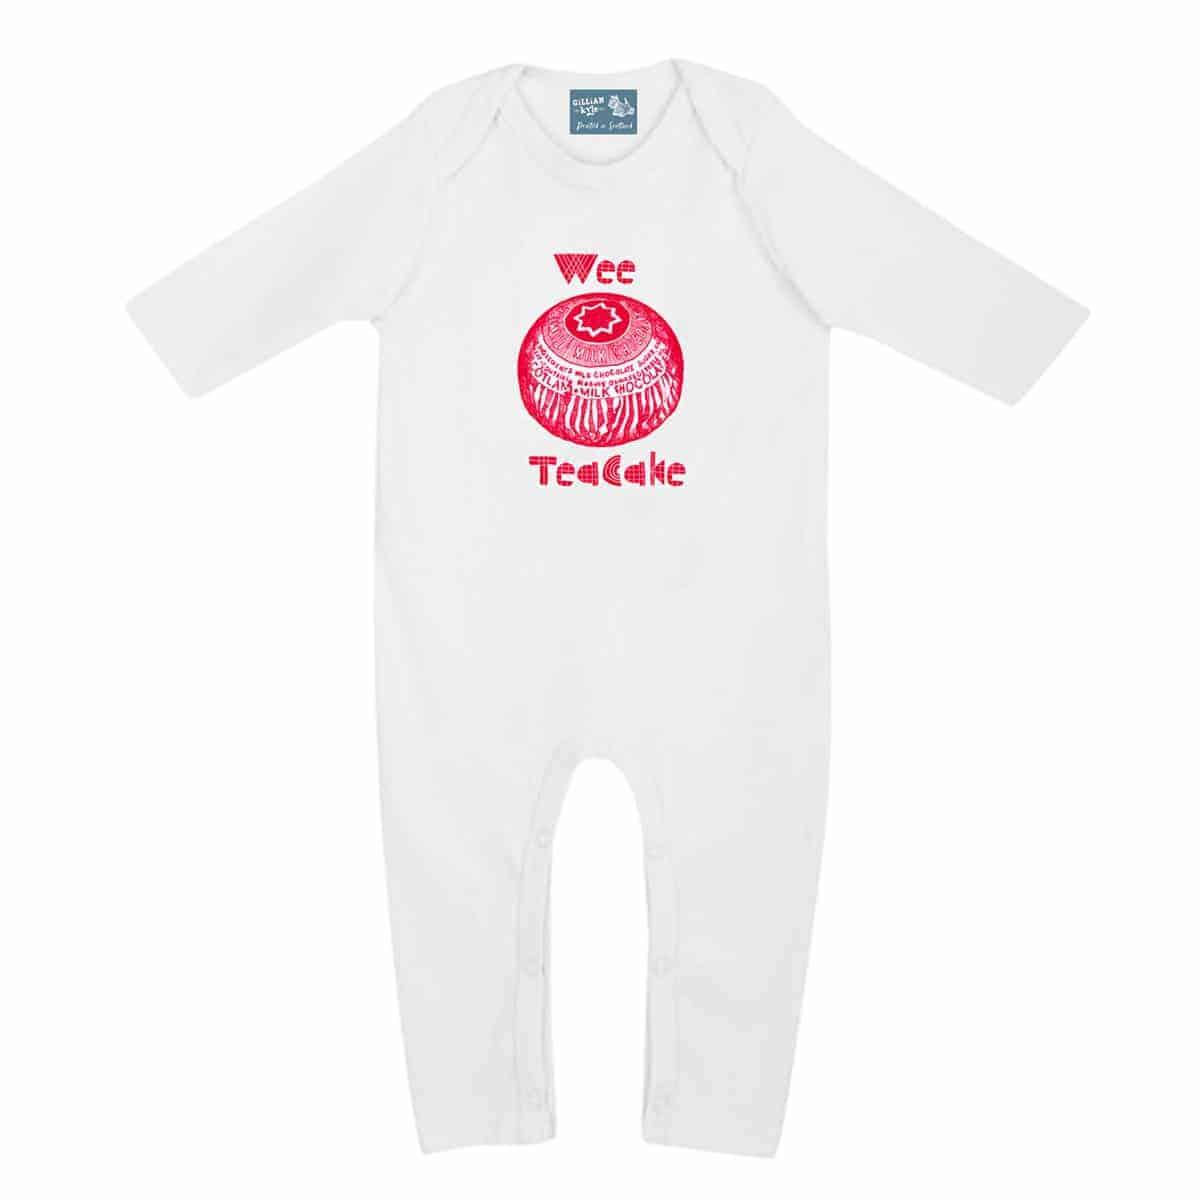 Baby Gifts Quirky : Gillian kyle scottish clothing tunnocks teacake wee baby